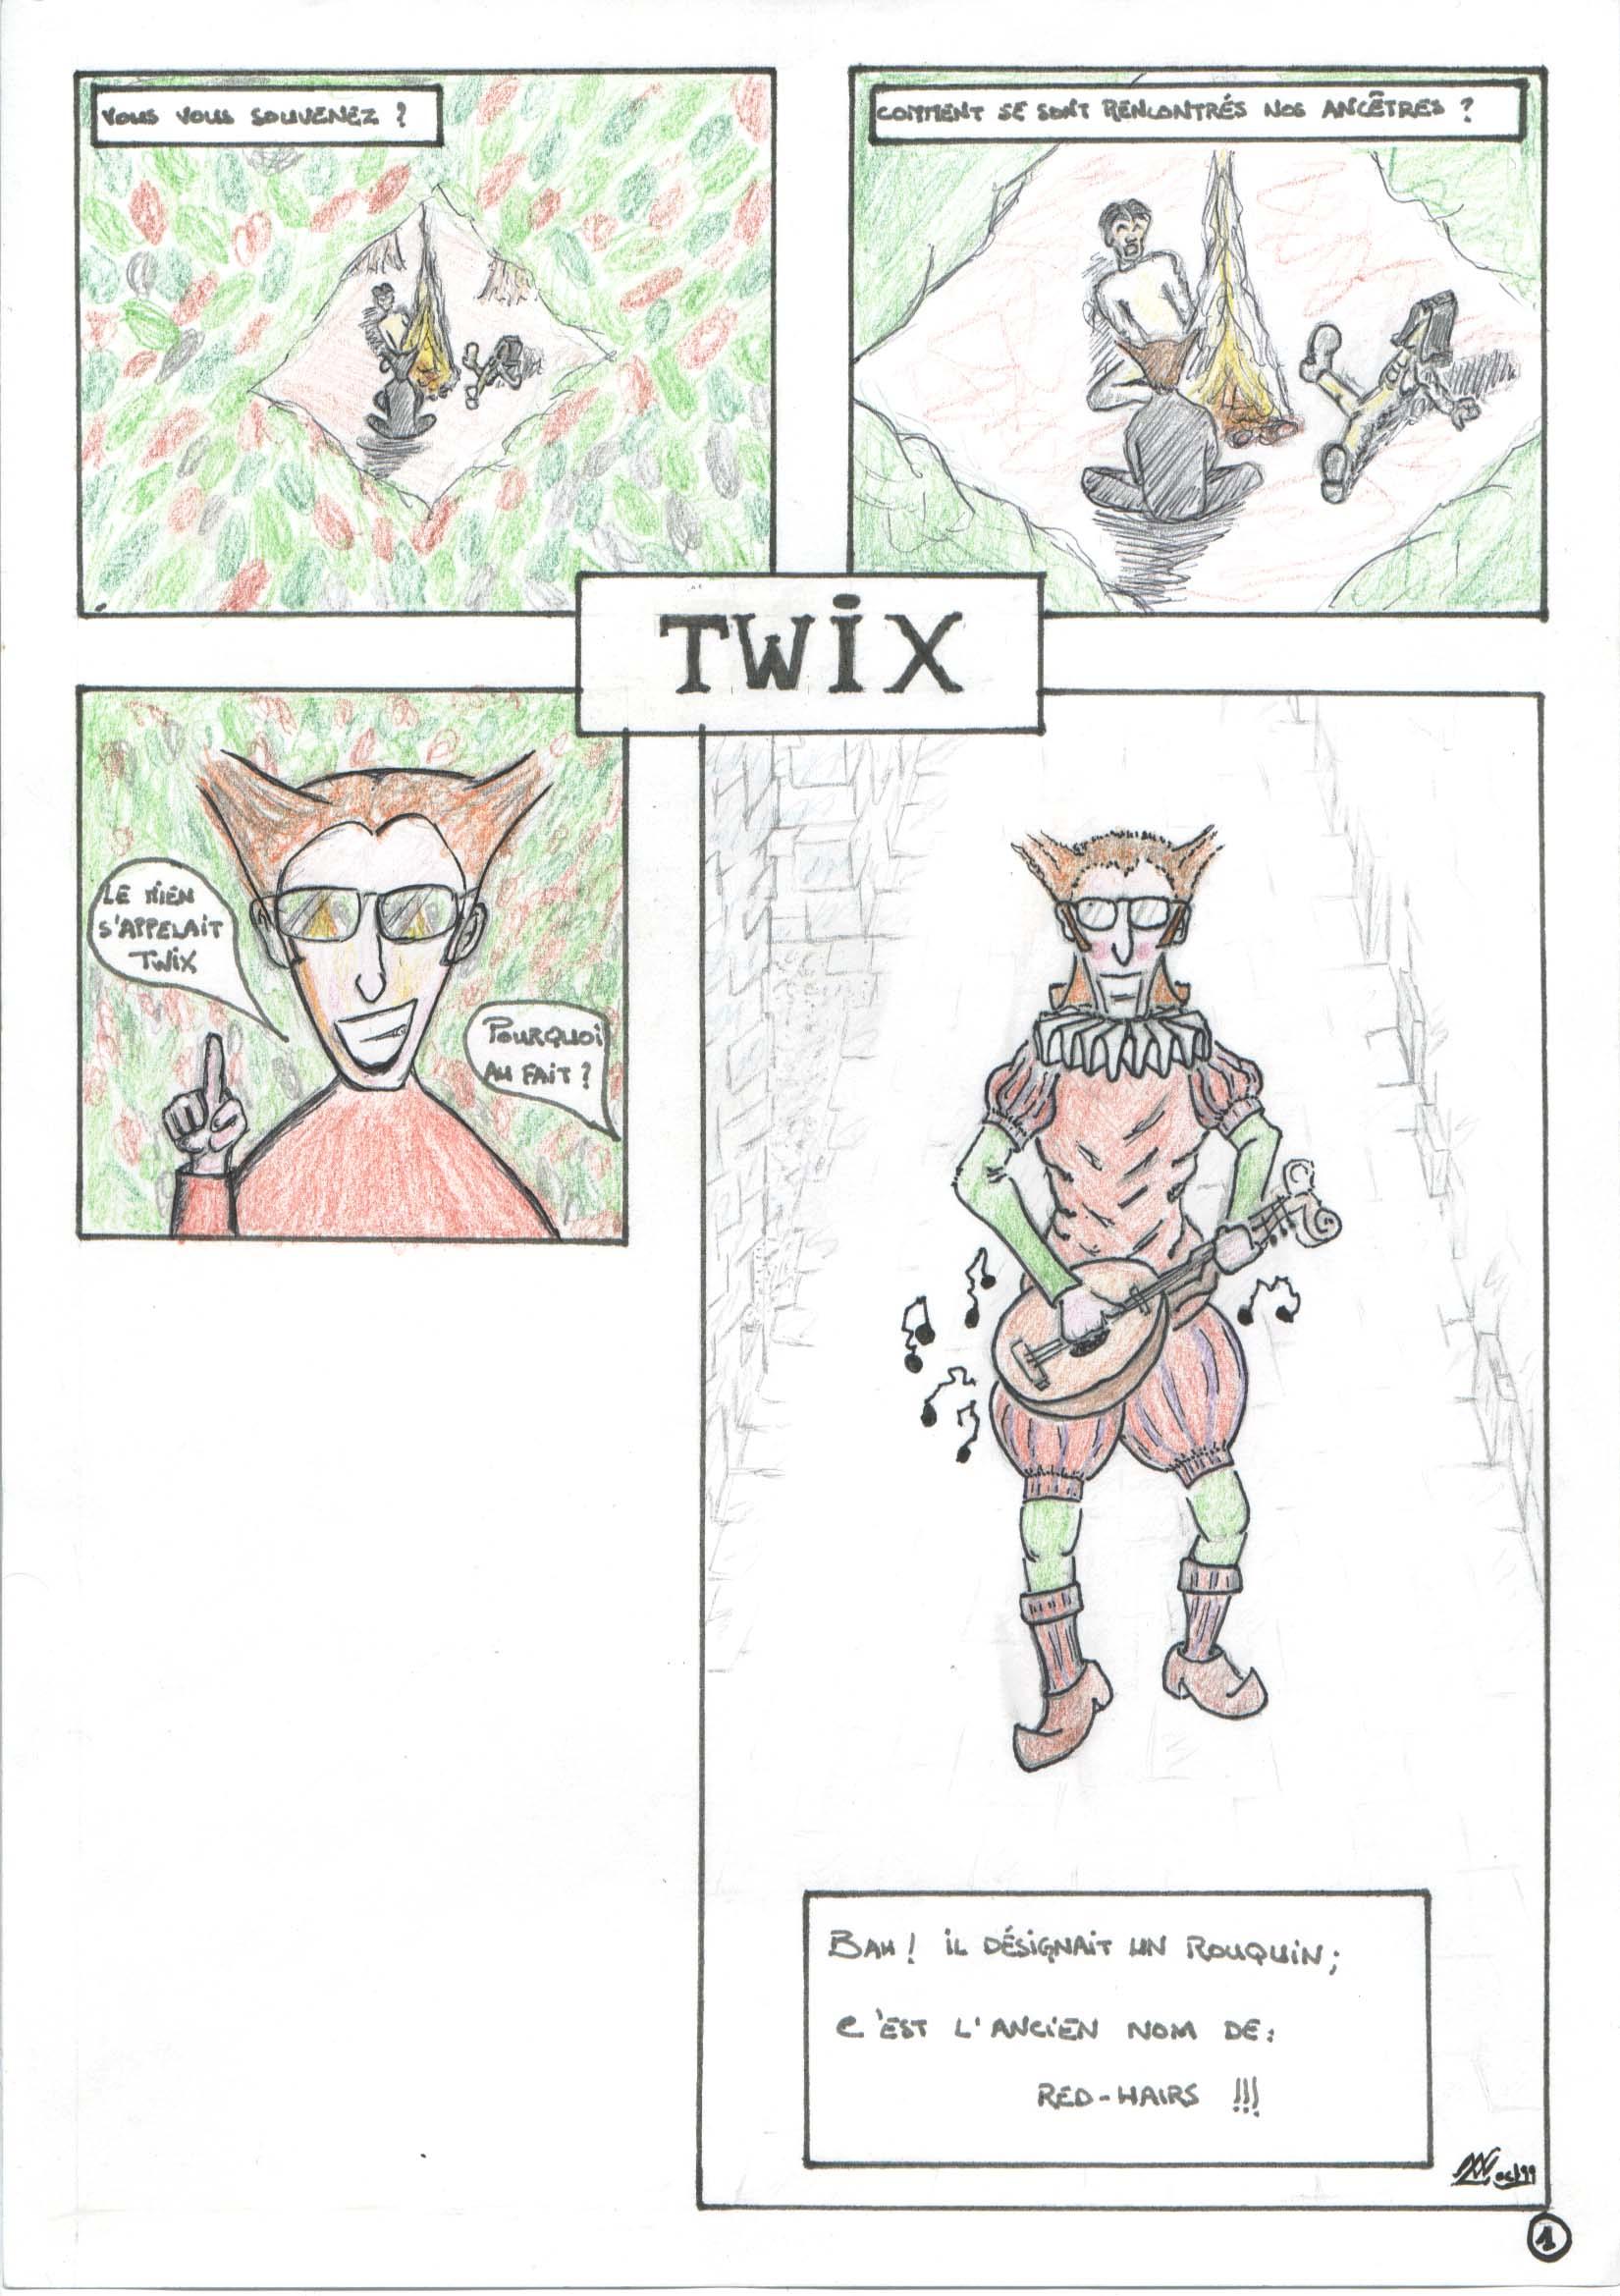 P01 La rencontre - Twix